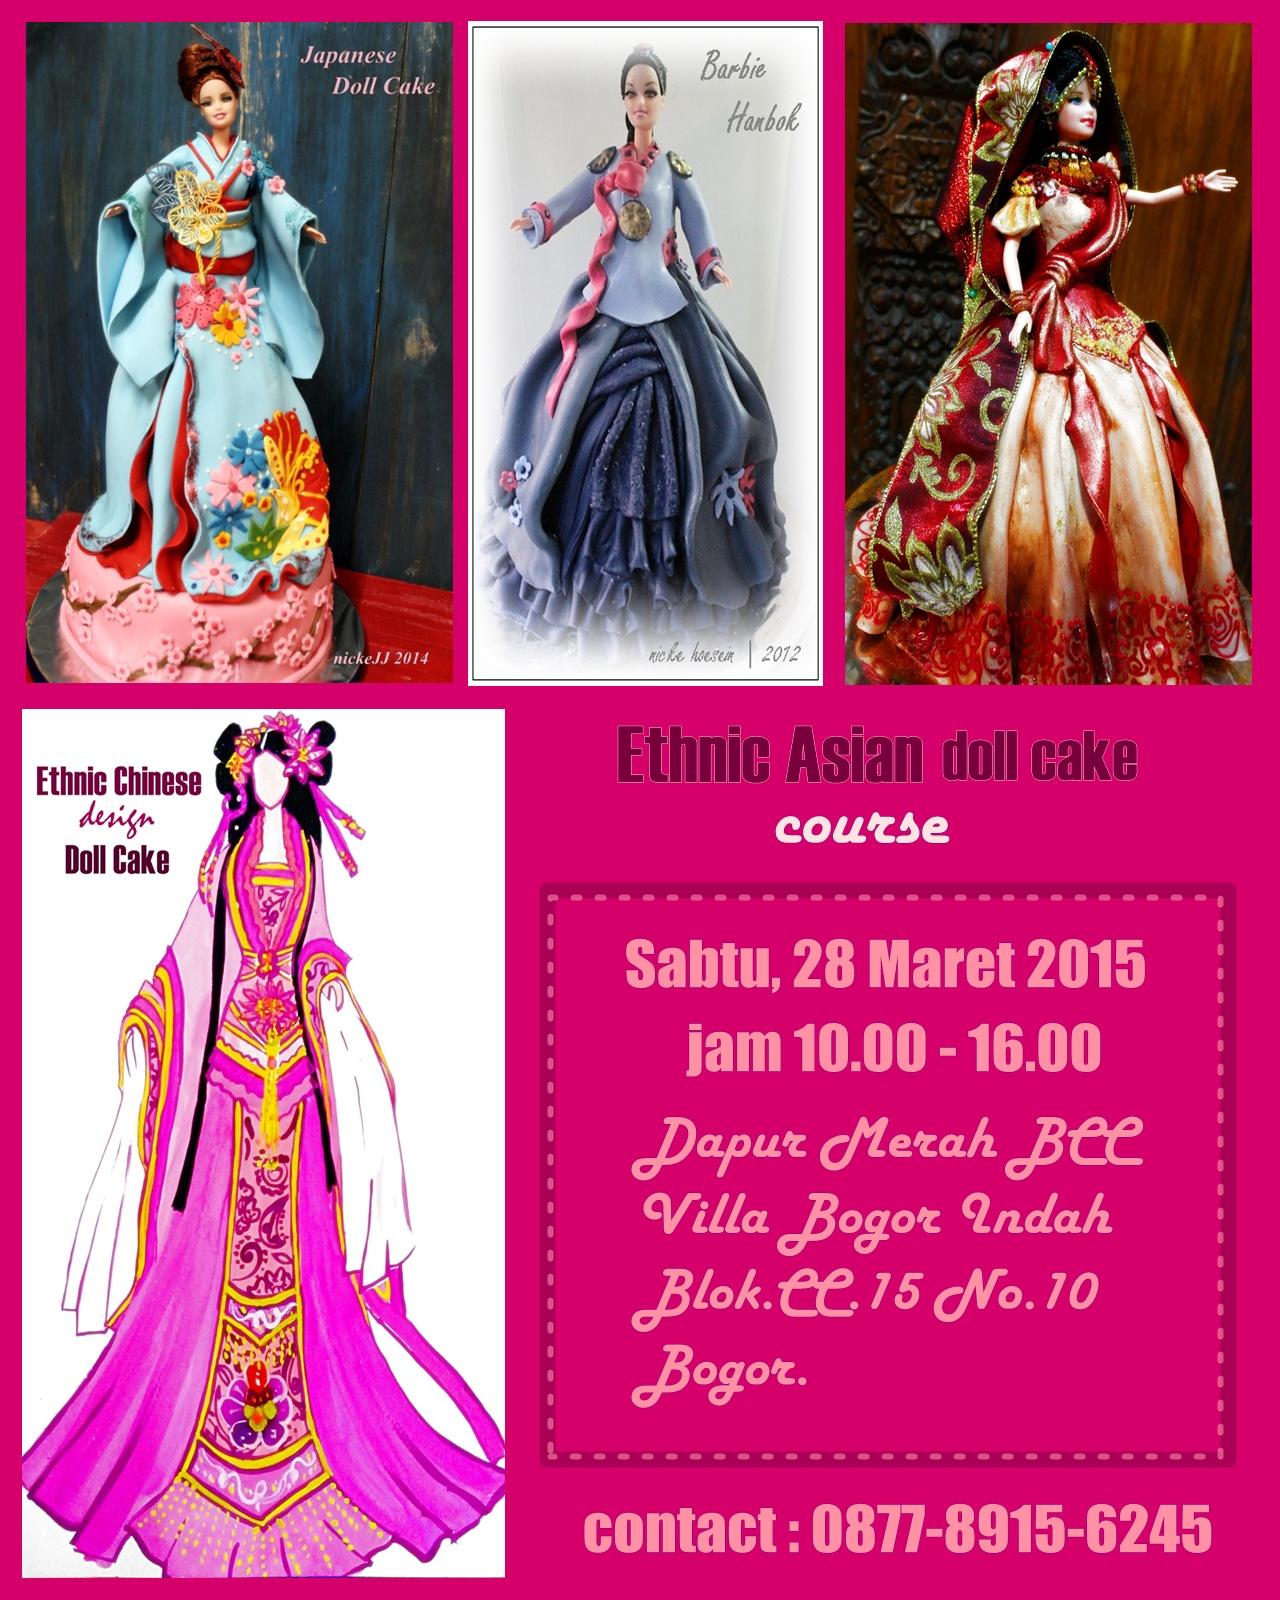 Ethnic Asian Doll Cake course ….again atBOGOR